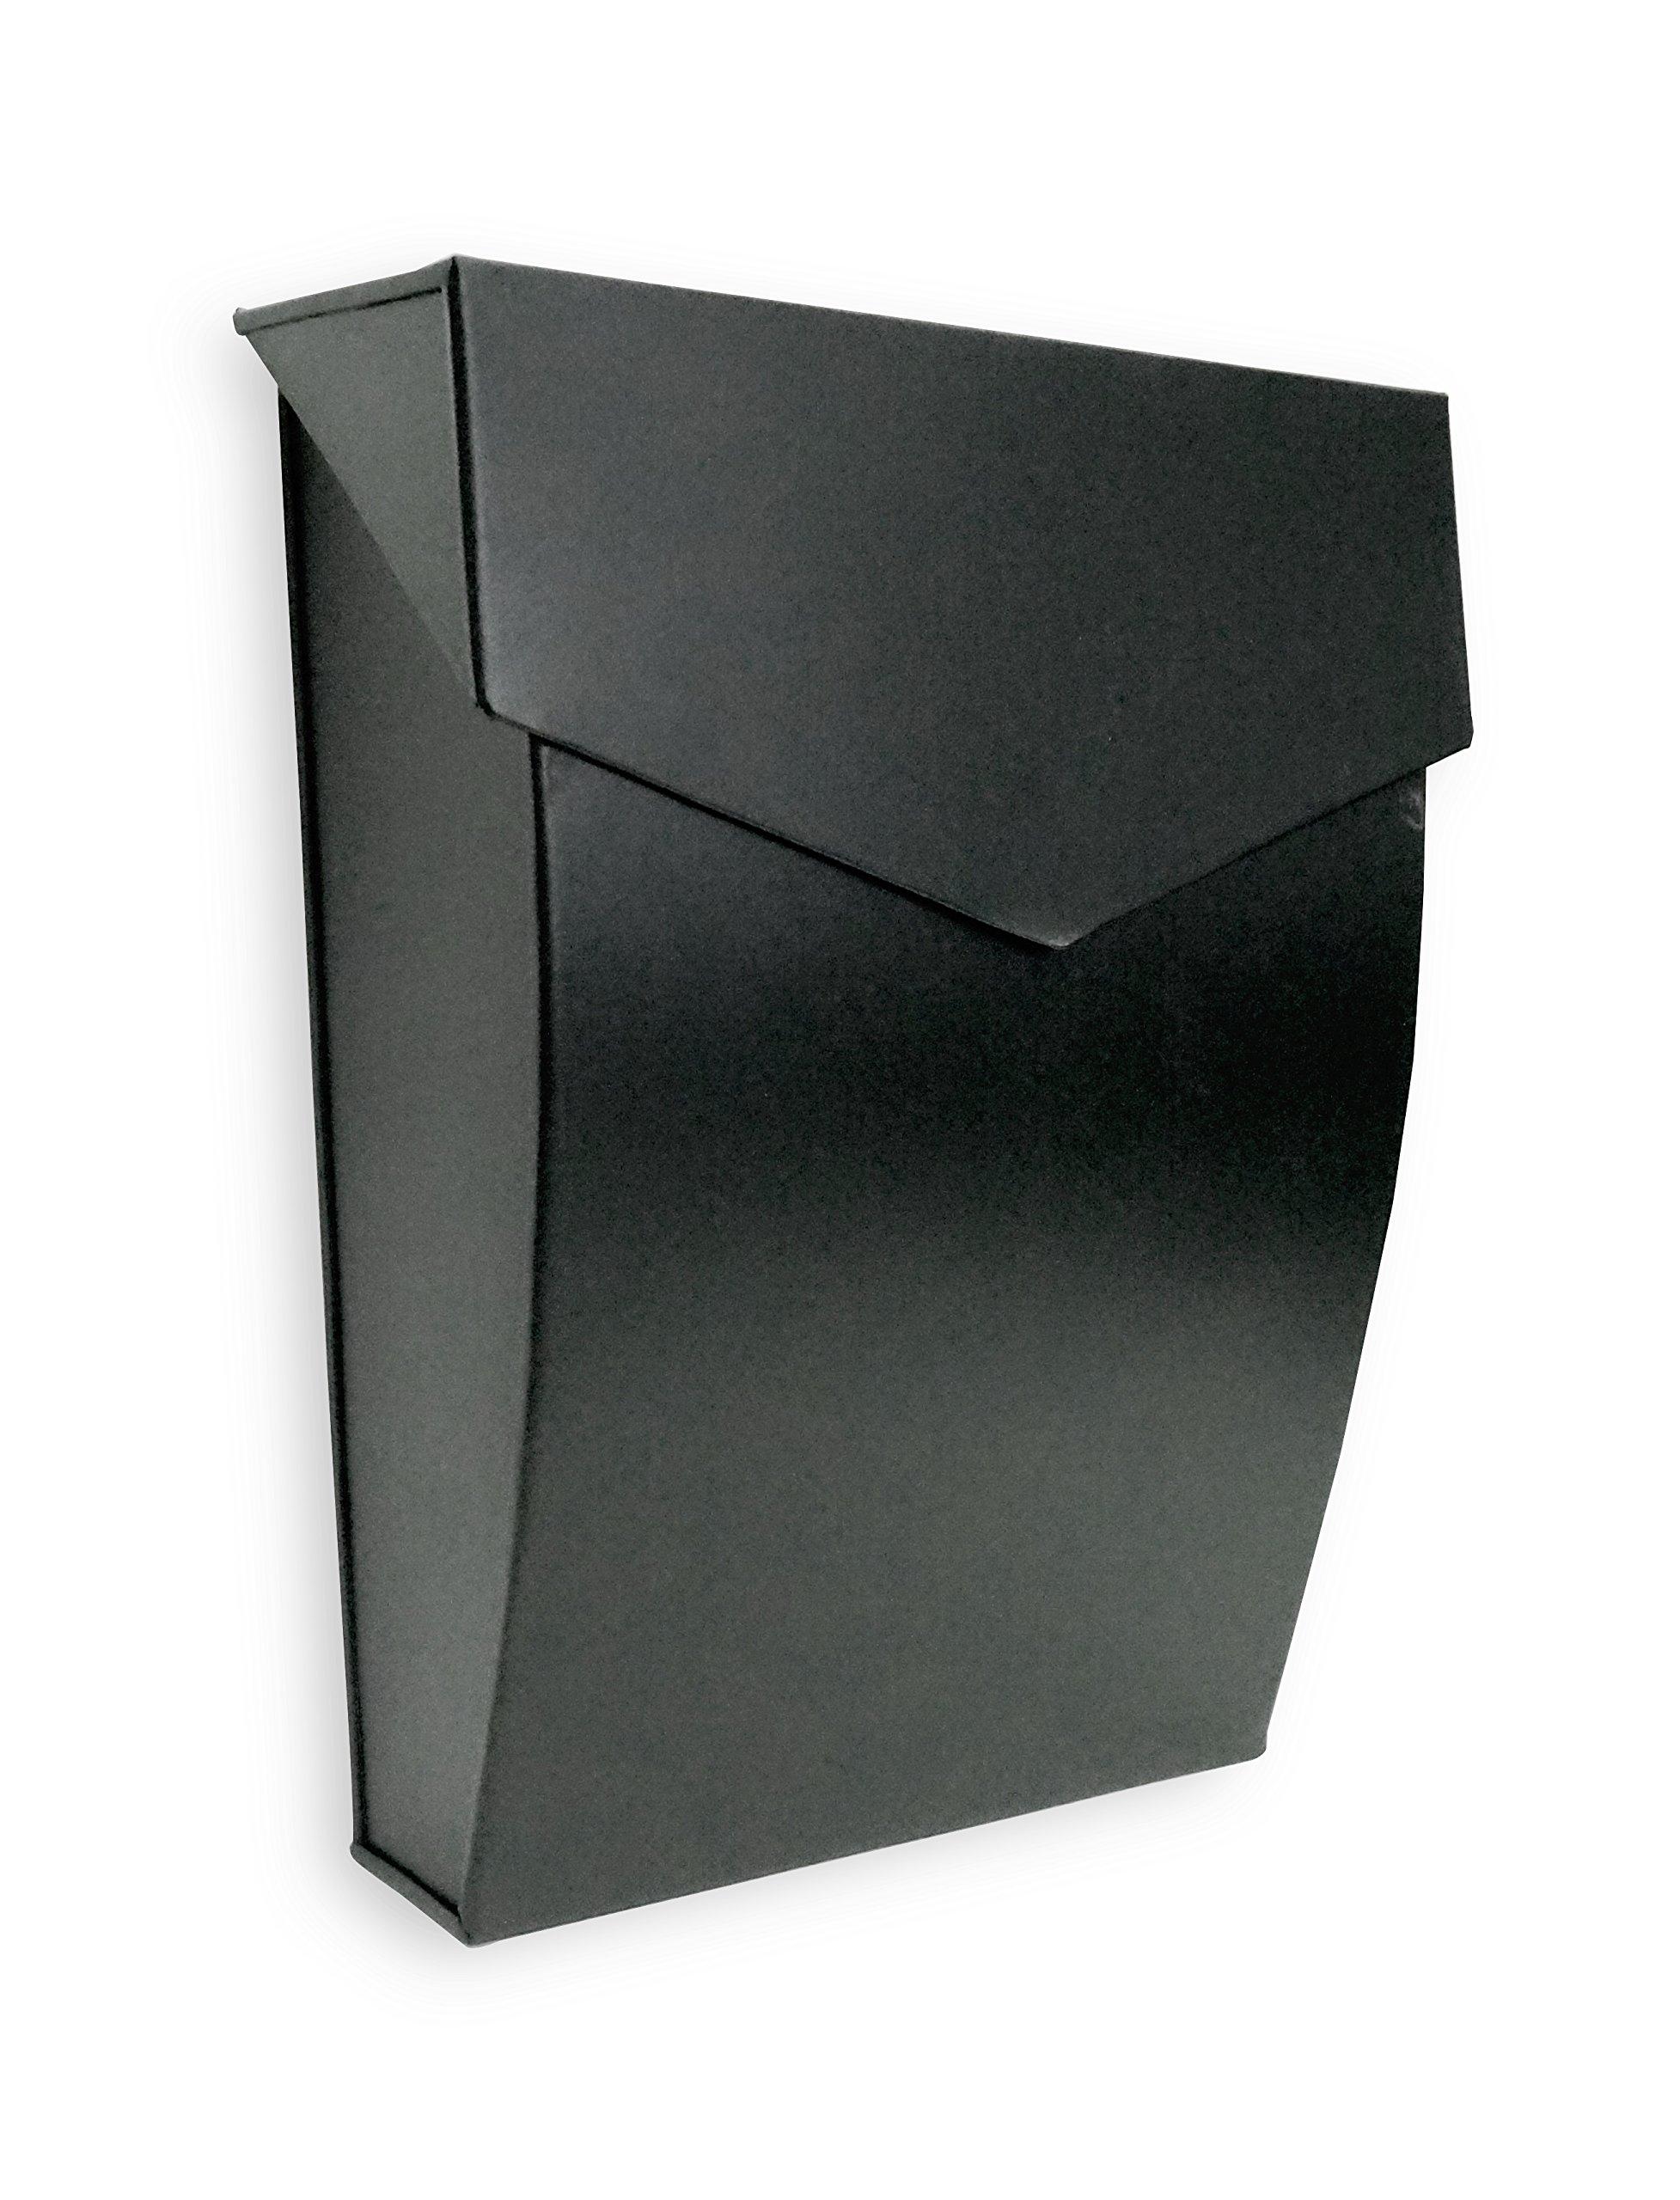 NACH MB-6921BLK Bradley Steel Mailbox - Wall Mounted Post Box, Black, 10 x 4.8 x 13 inch